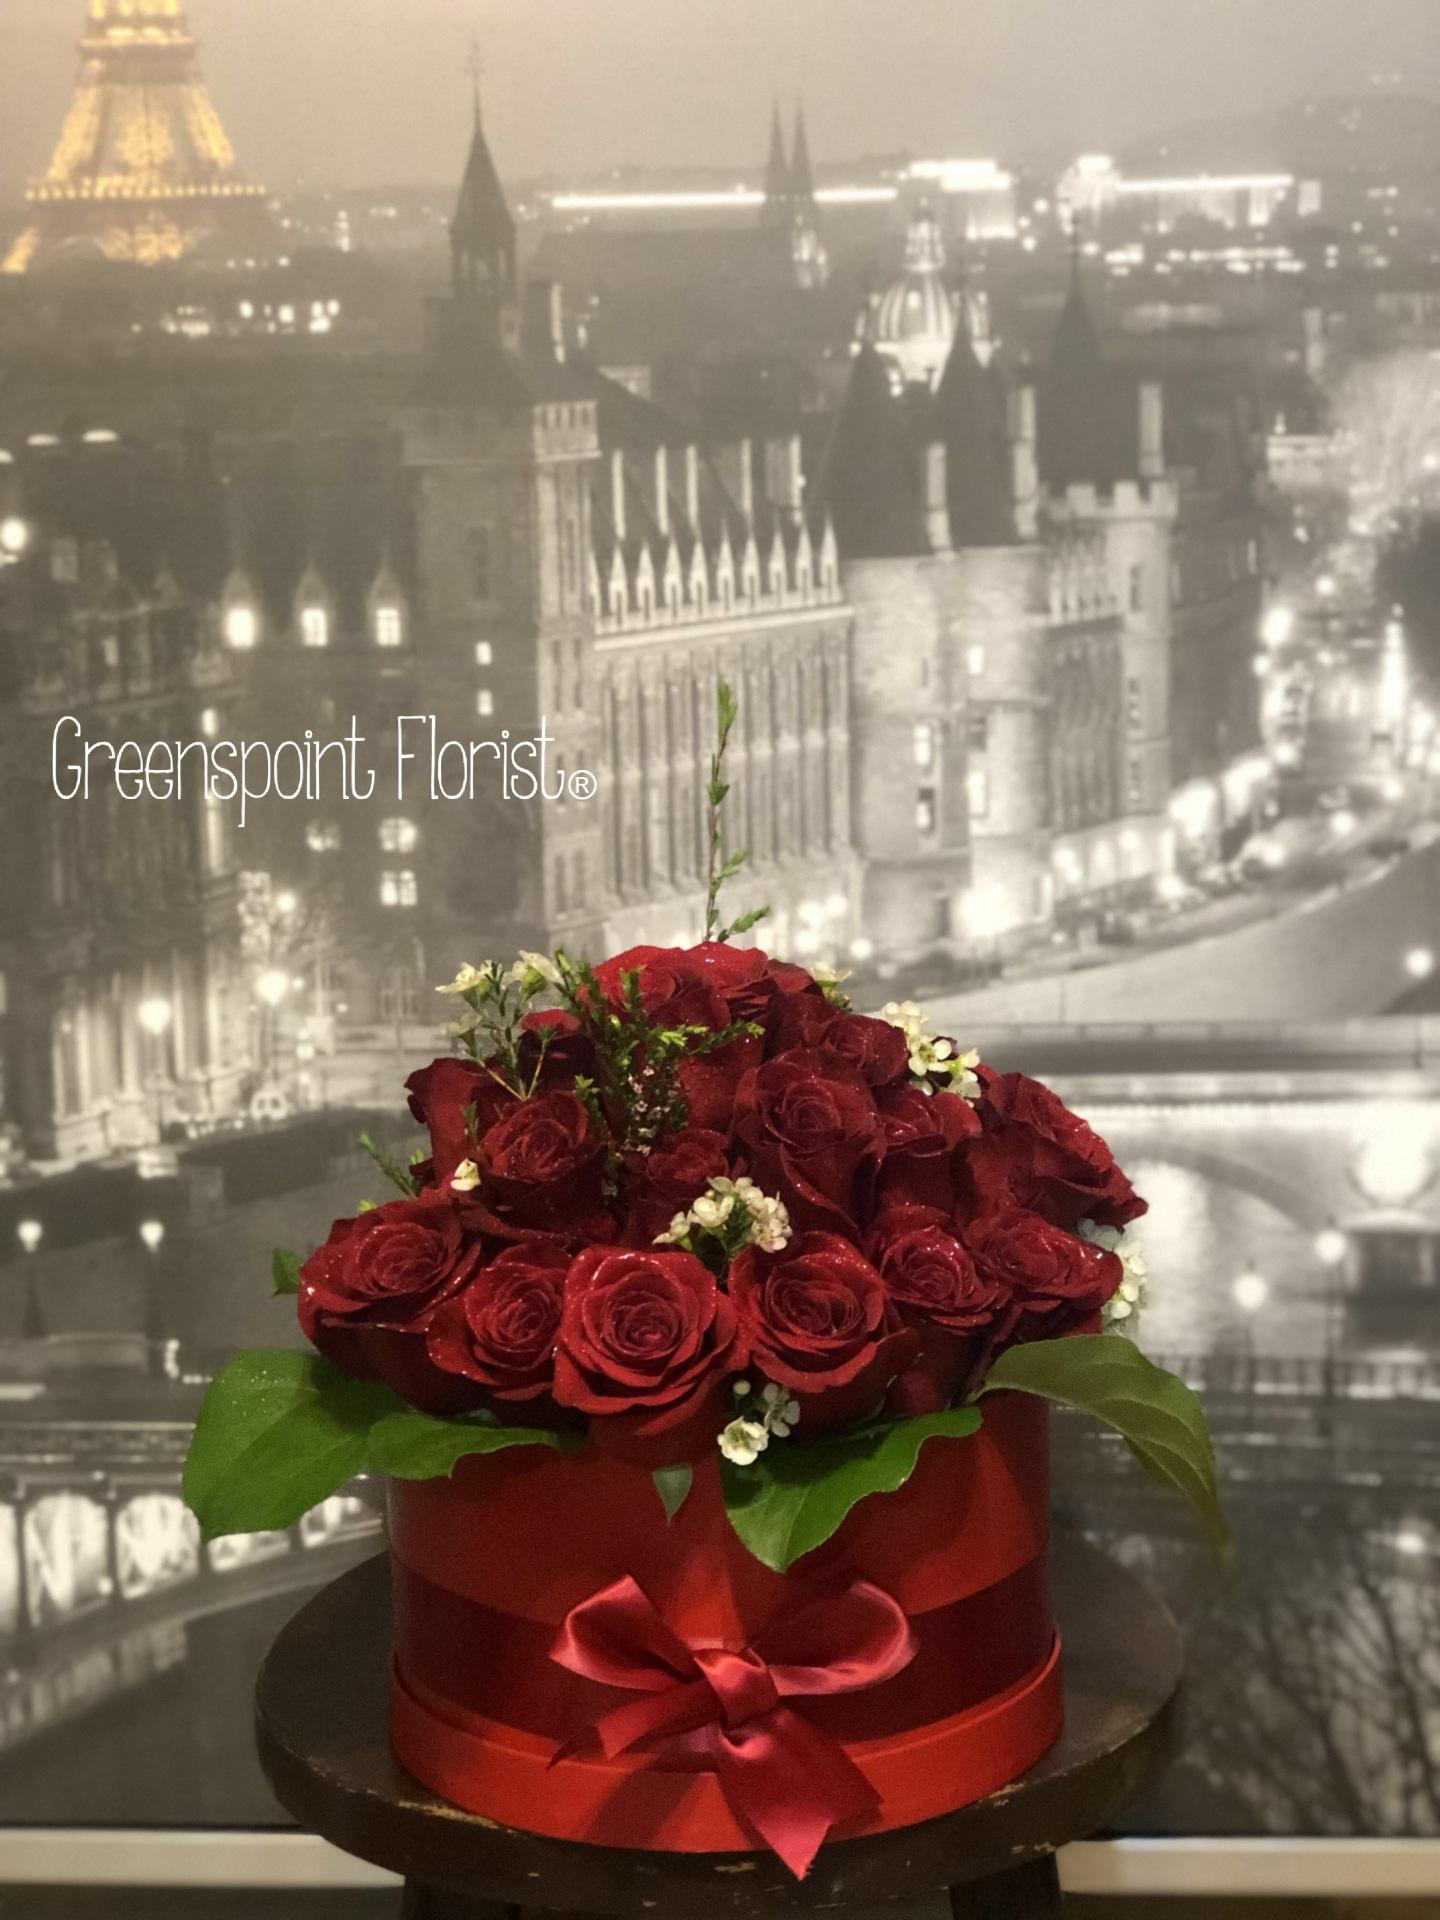 36 Roses. $179.99